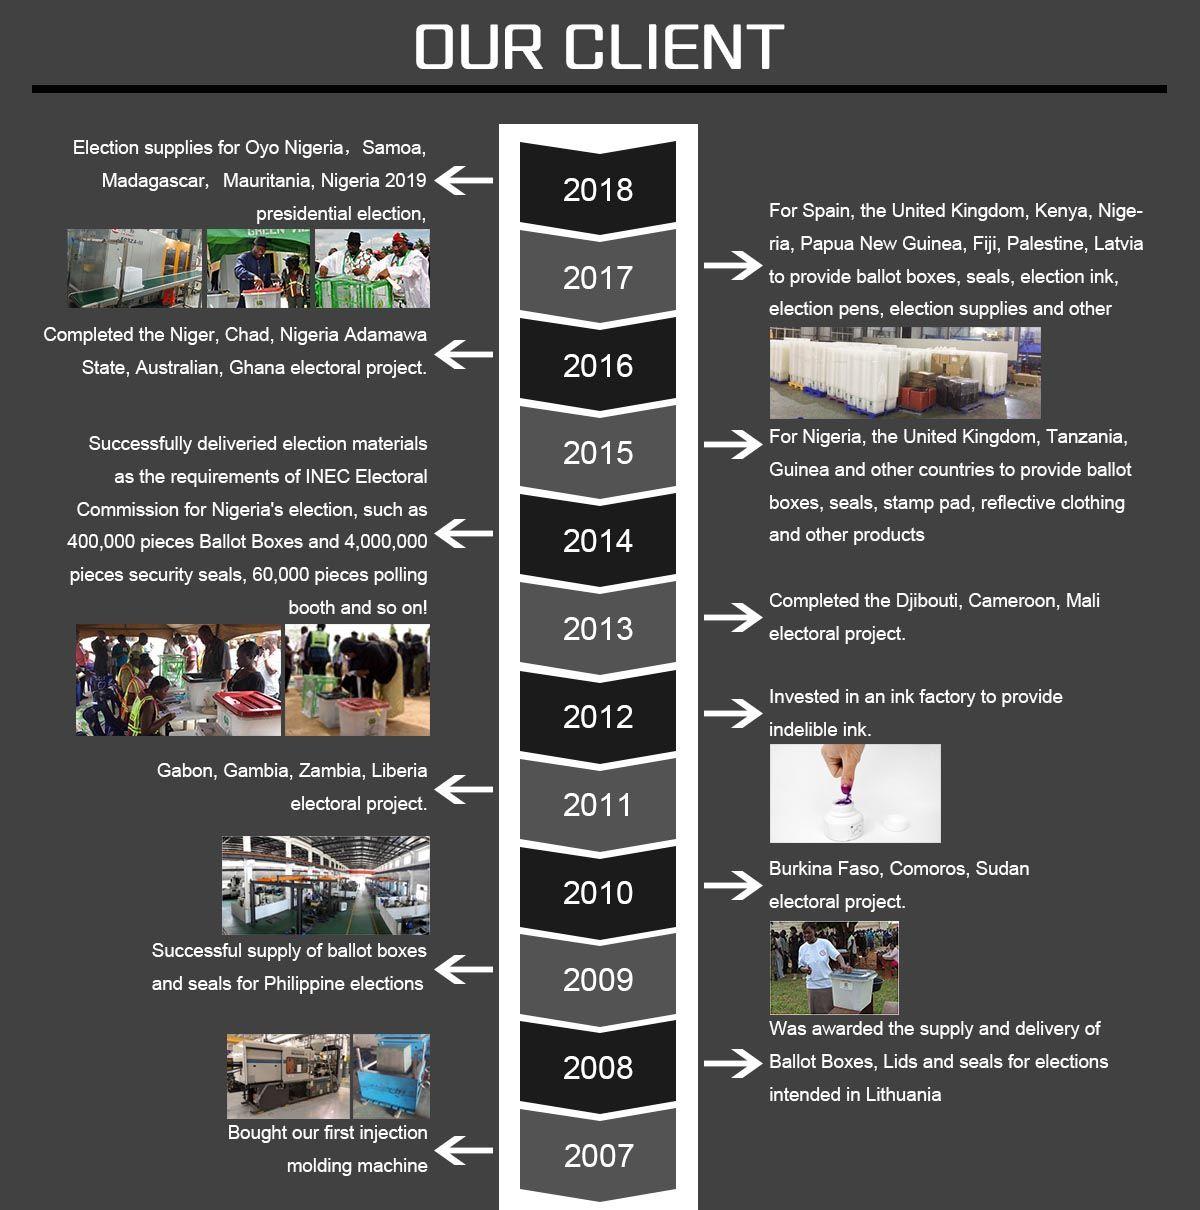 election-supplies-company-history-2